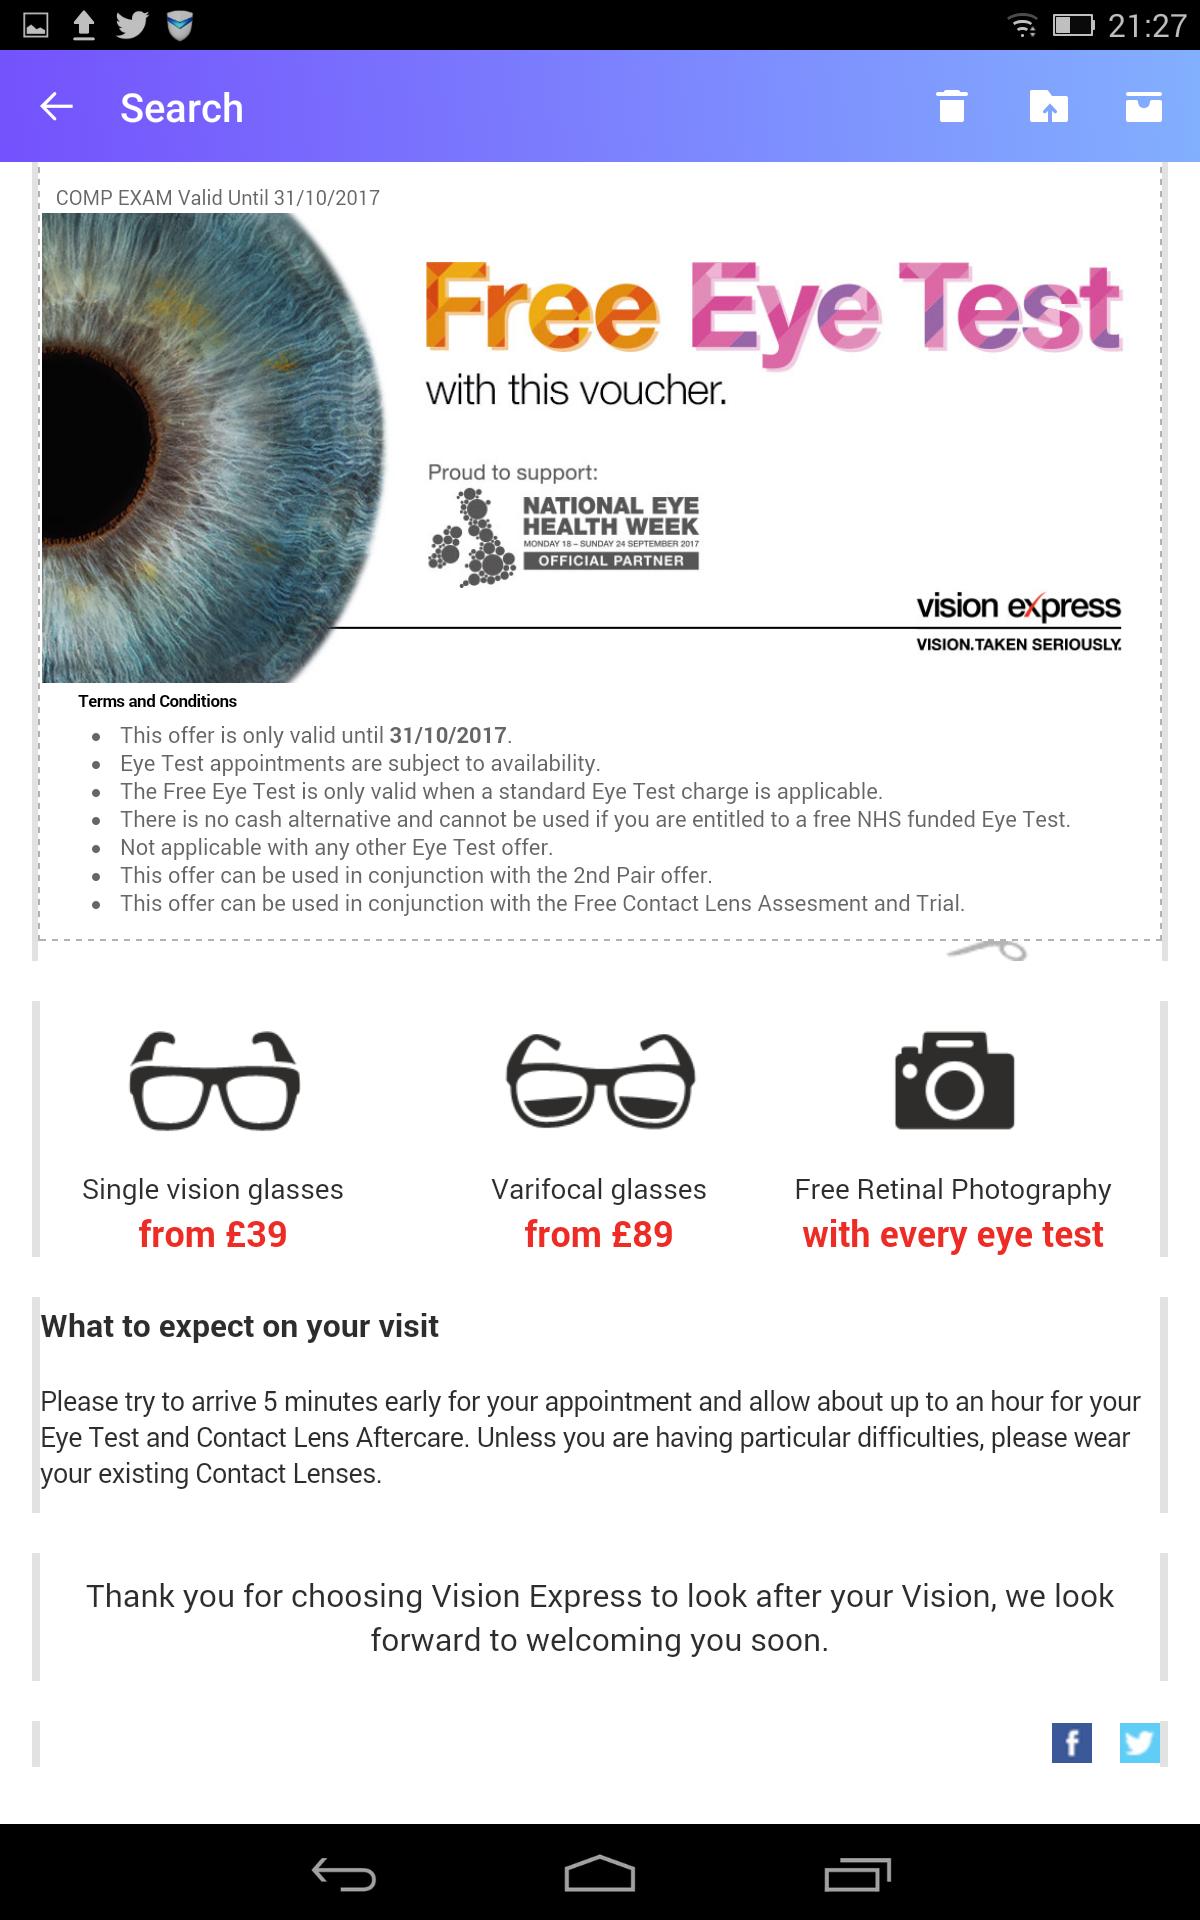 Free Eye Test at Vision Express until 31.10.17